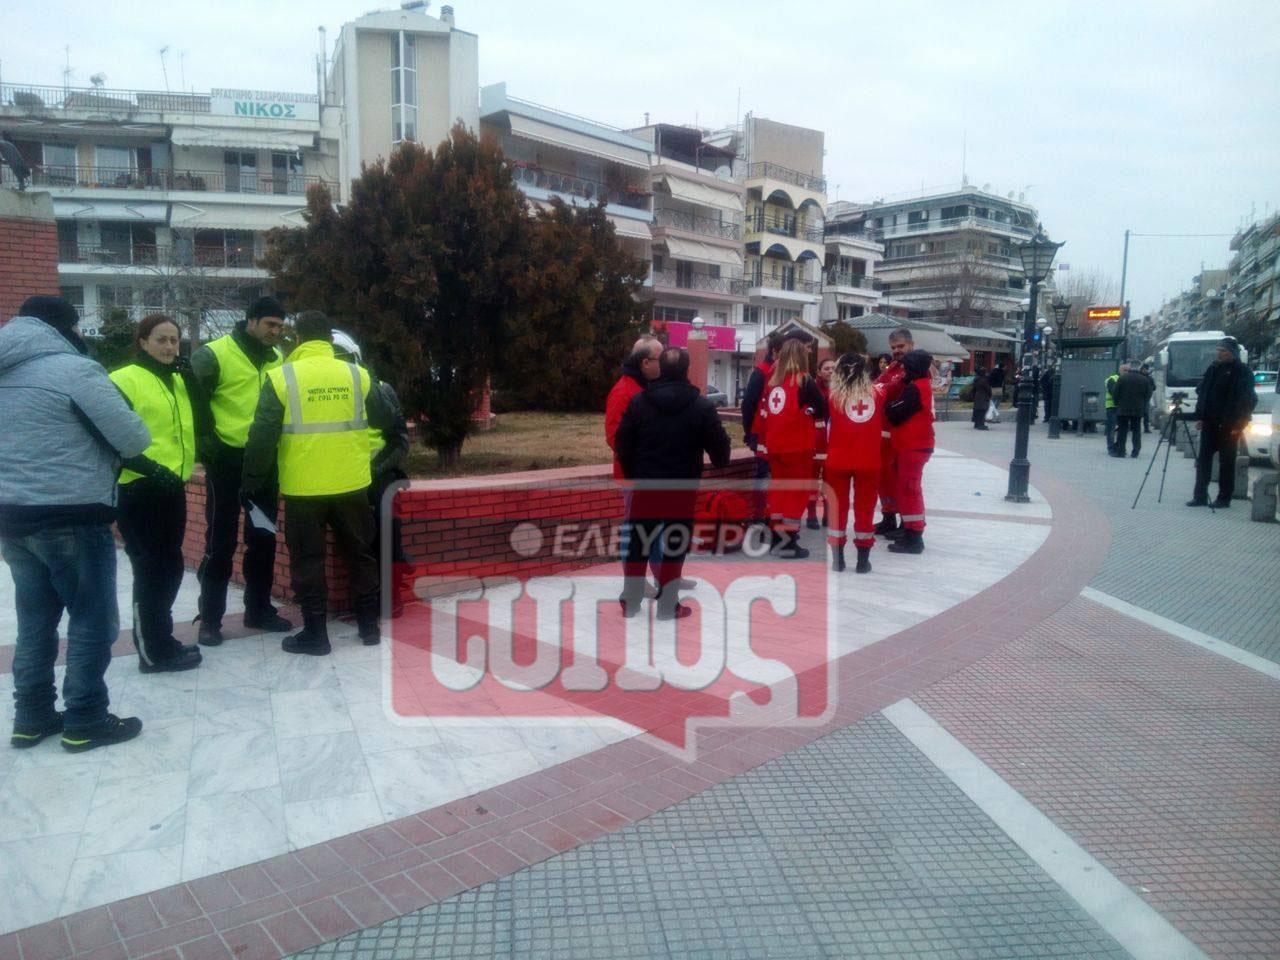 kordelio-ekkeosi-vomva-14 Λήξη συναγερμού στο Κορδελιό - Επιστρέφουν οι κάτοικοι